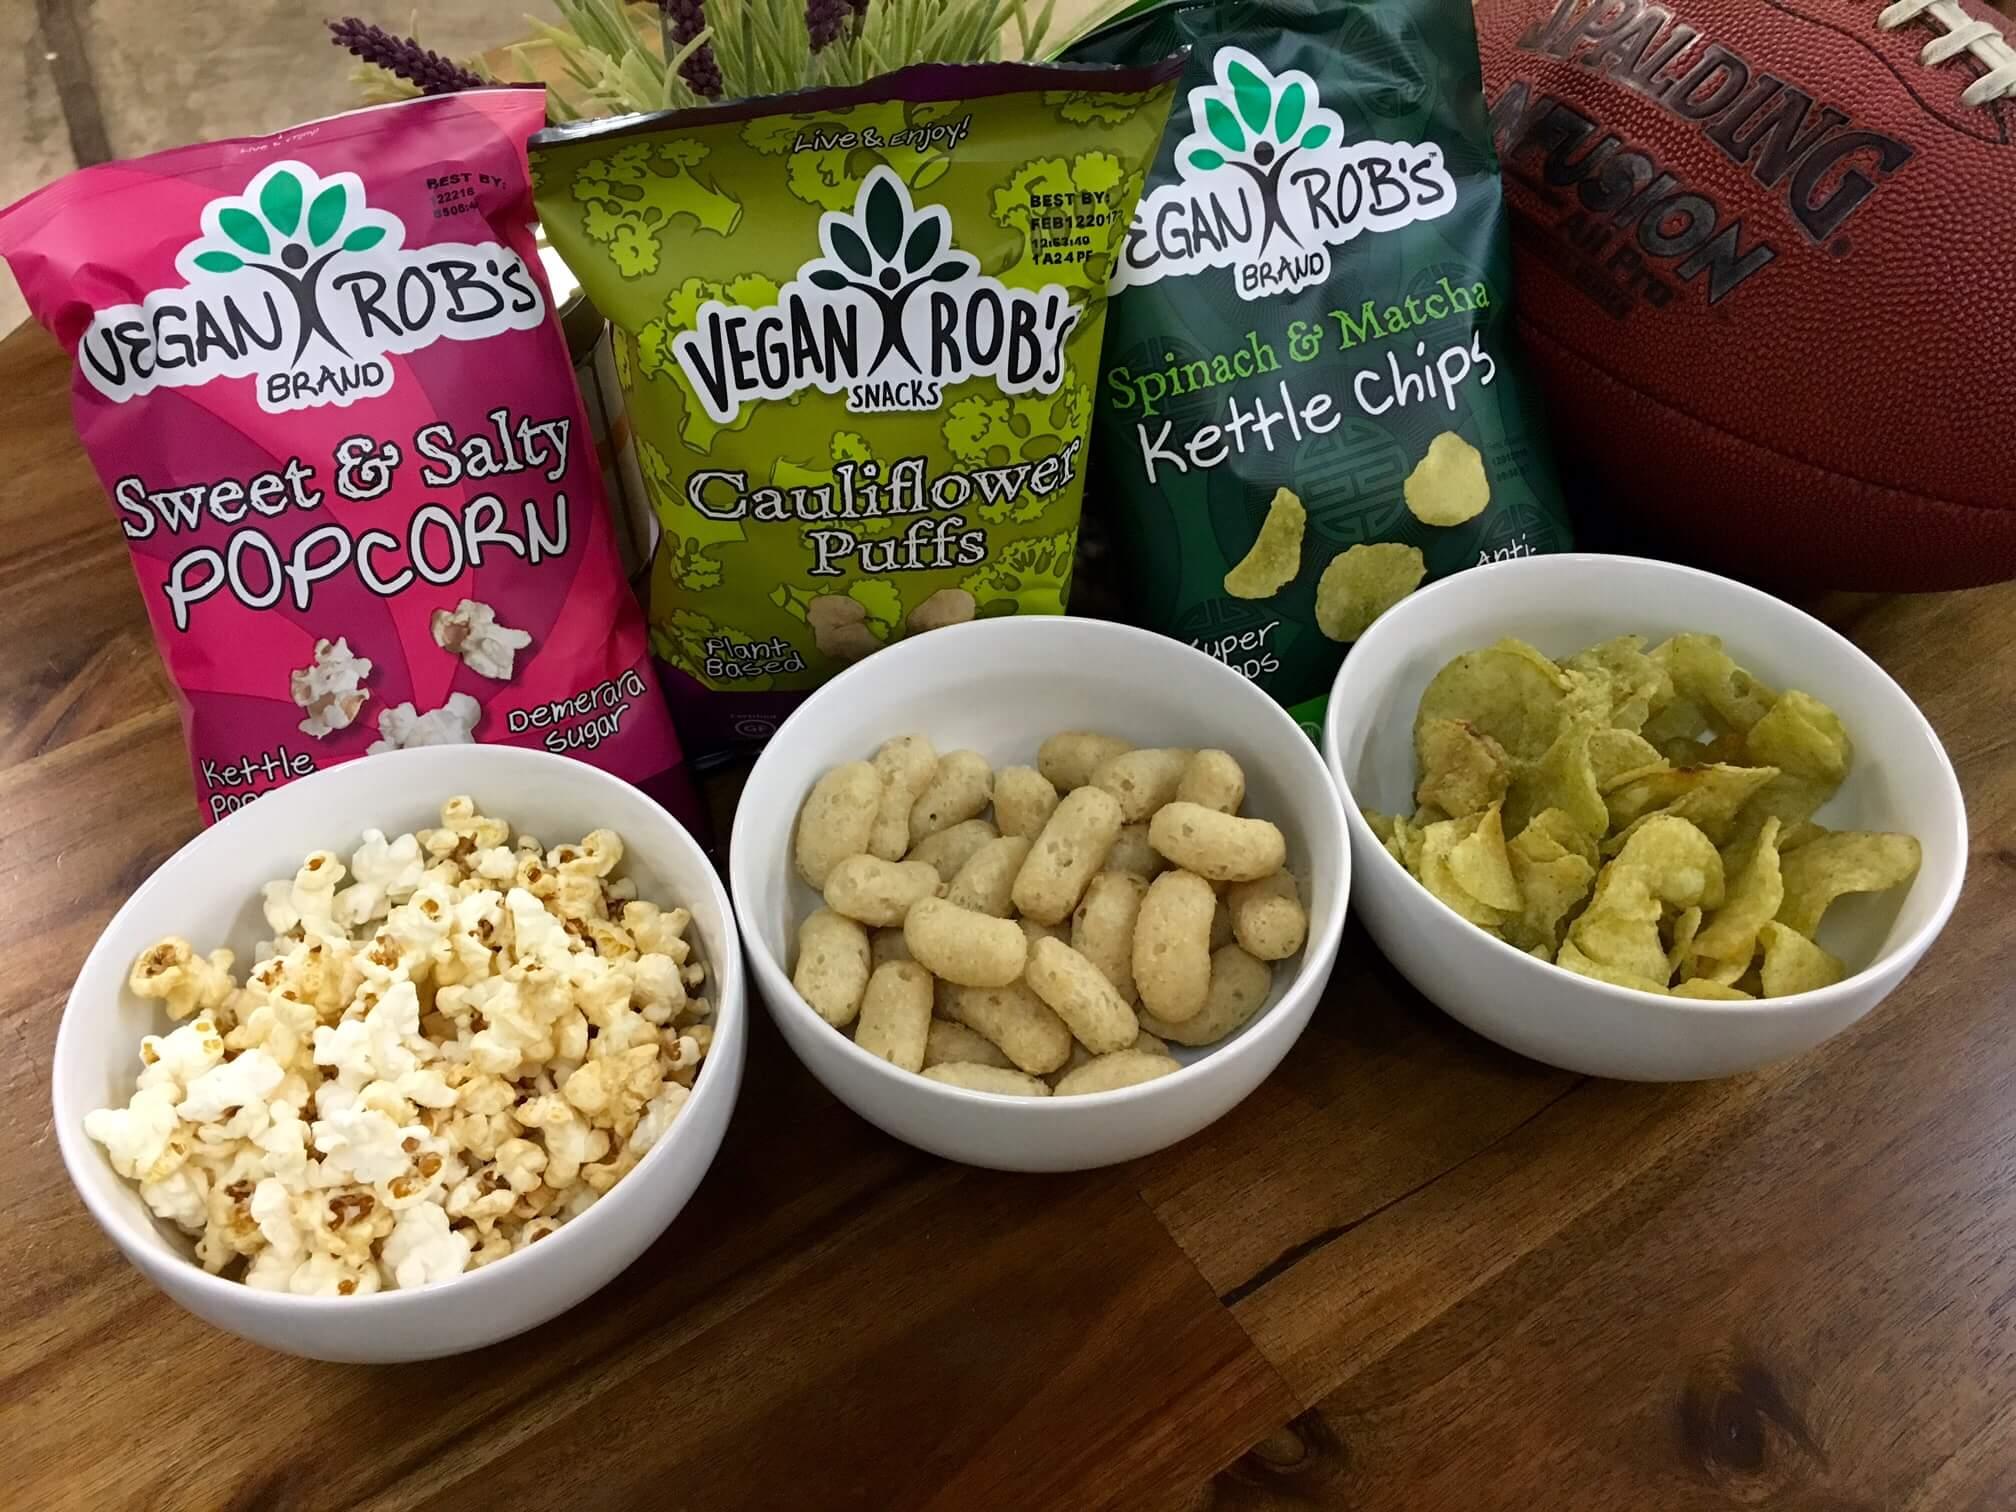 Rob's Brands Popcorn, chips & puffs